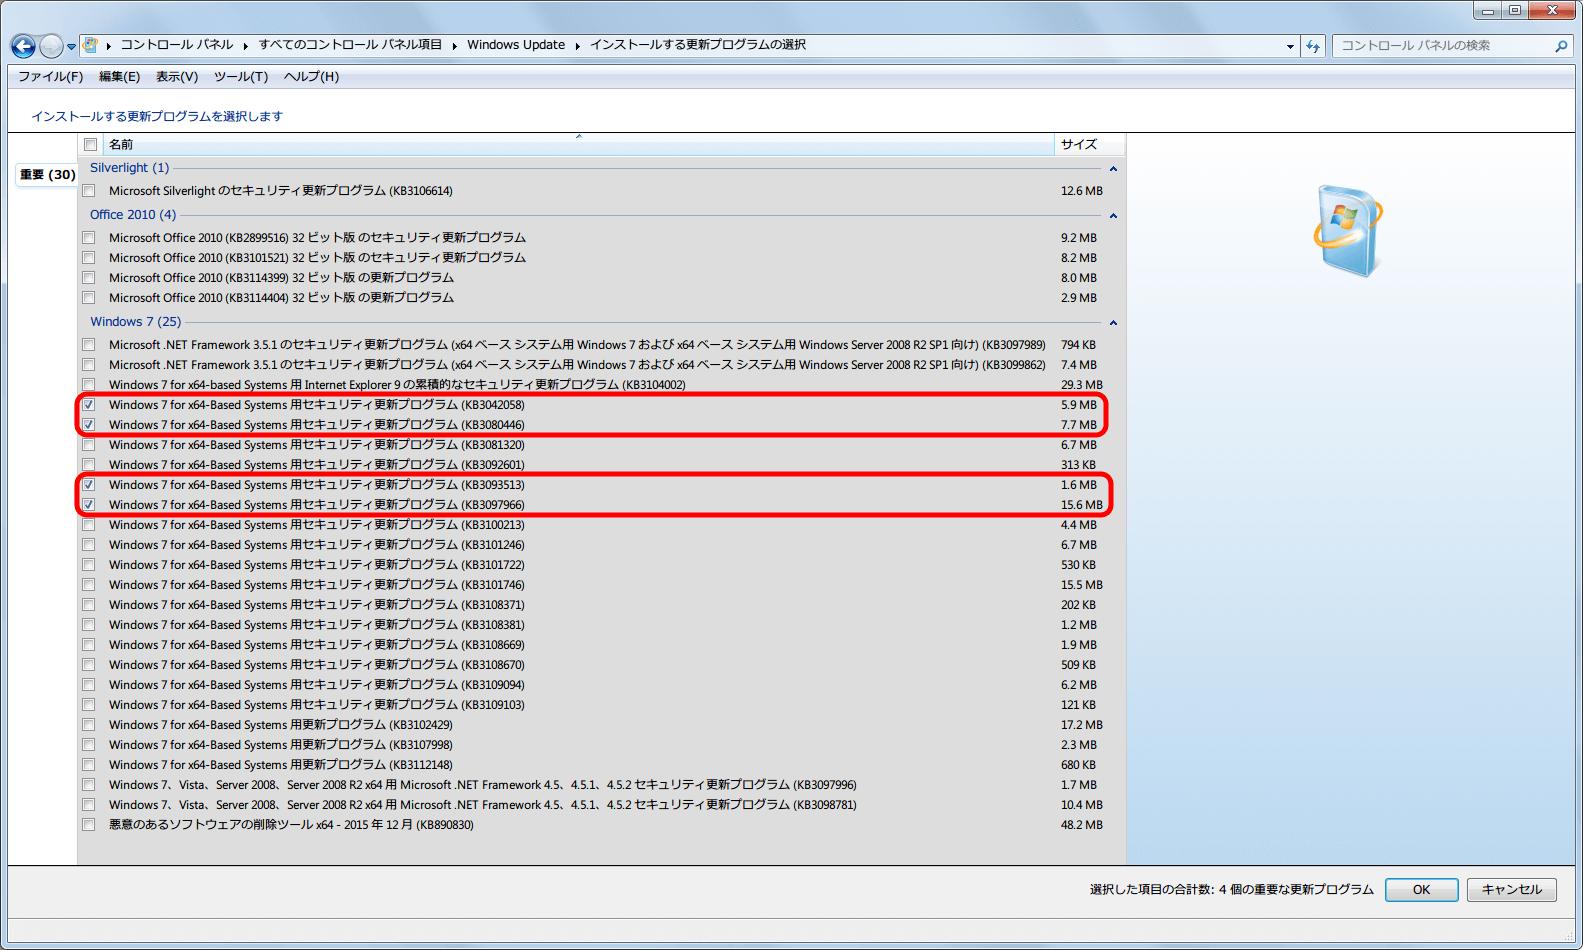 Windows Update 2015年10月分インストール後、再起動